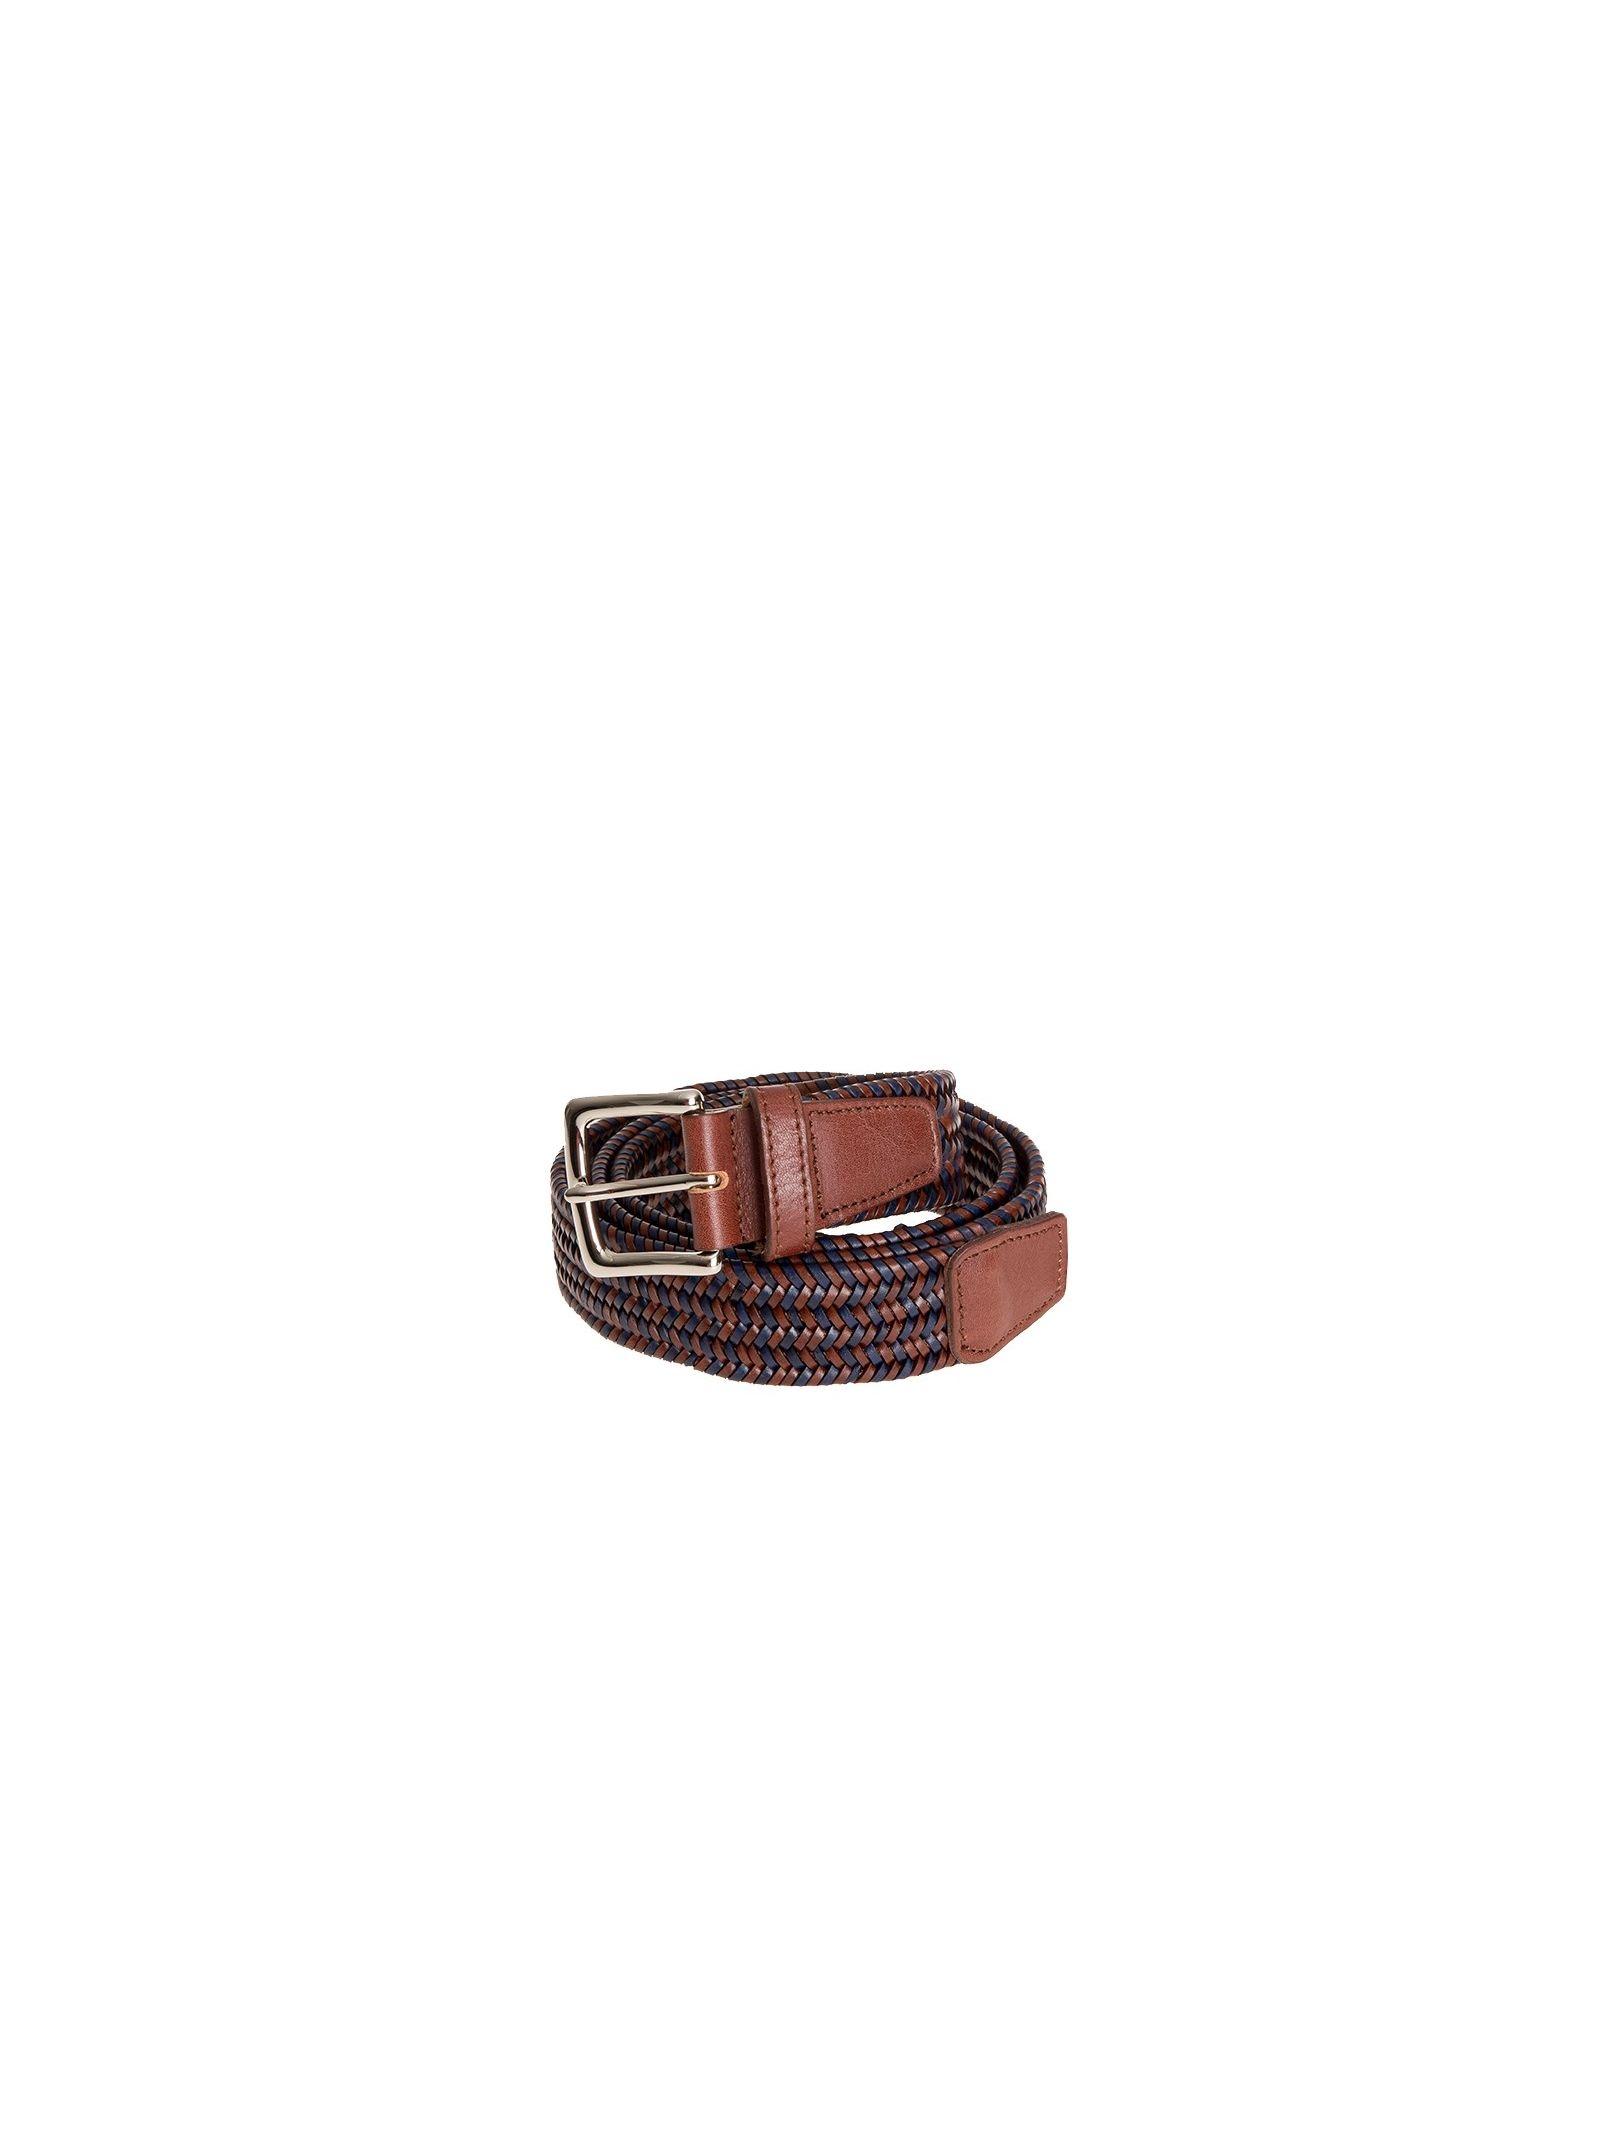 Leather Belt Andrea D'amico Acu2219 970